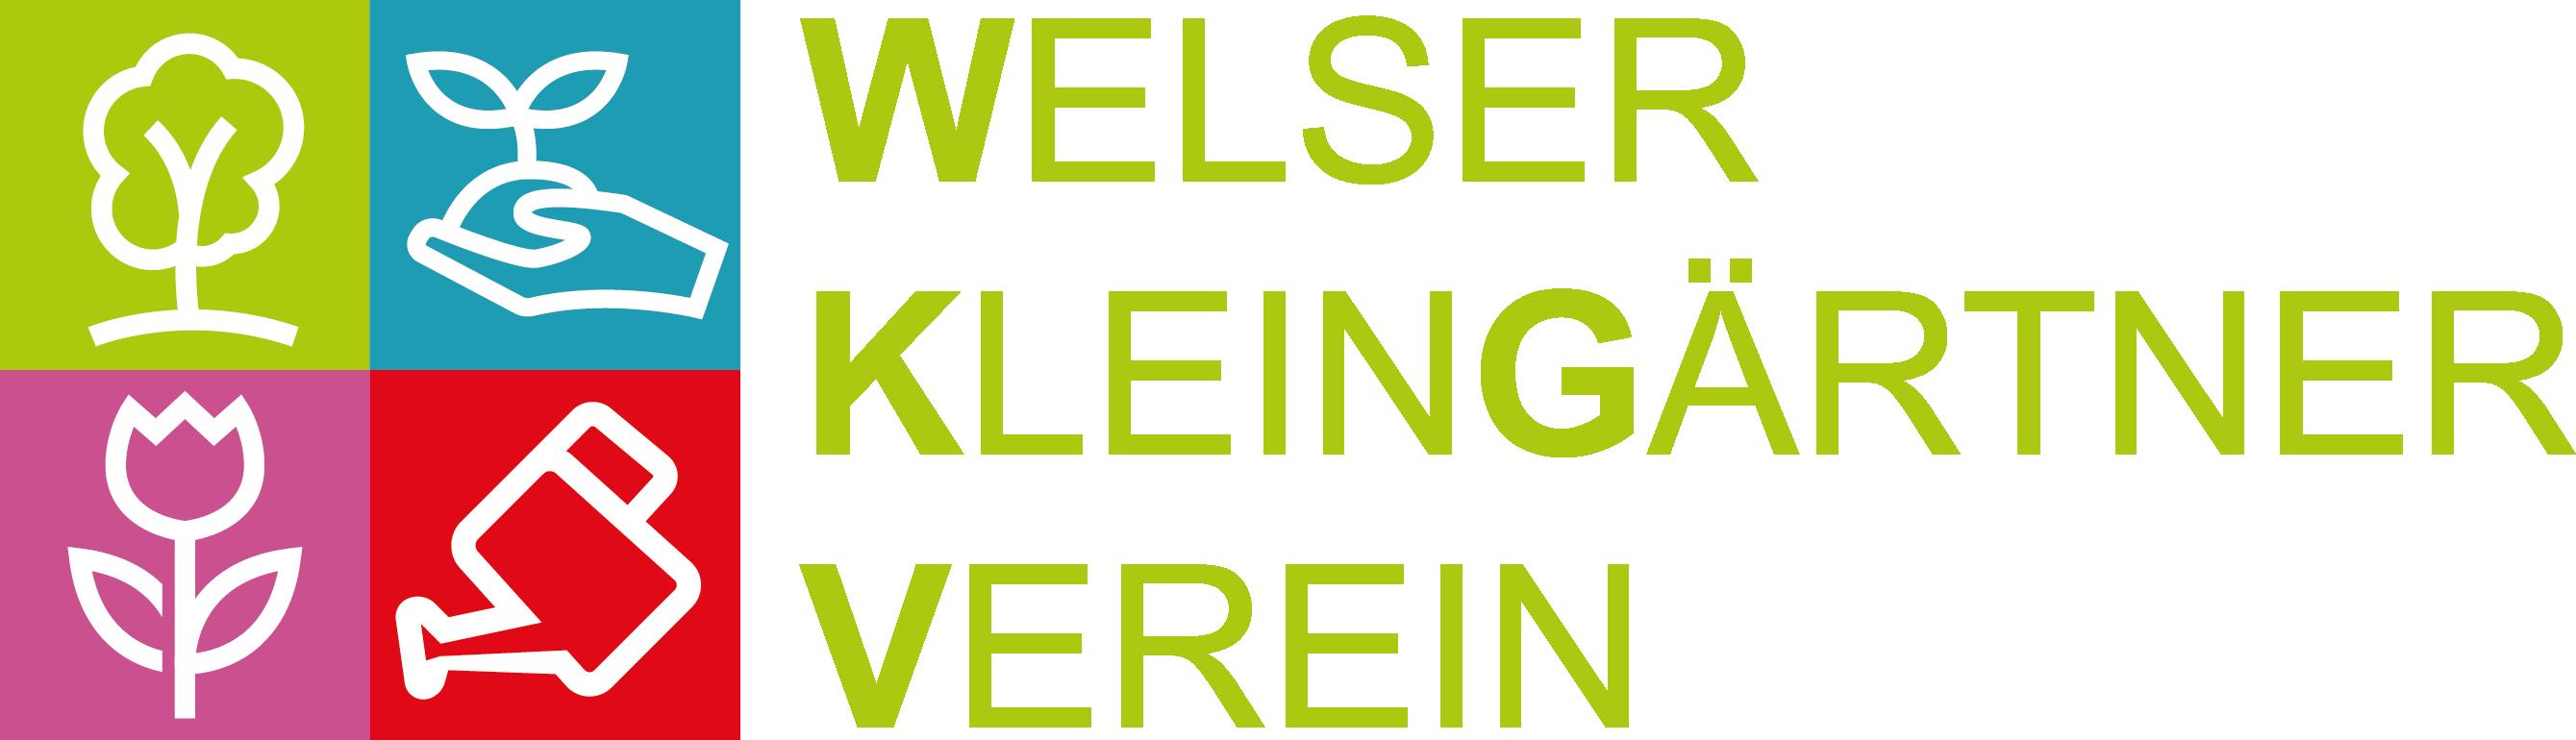 Welser Kleingärtner Verein